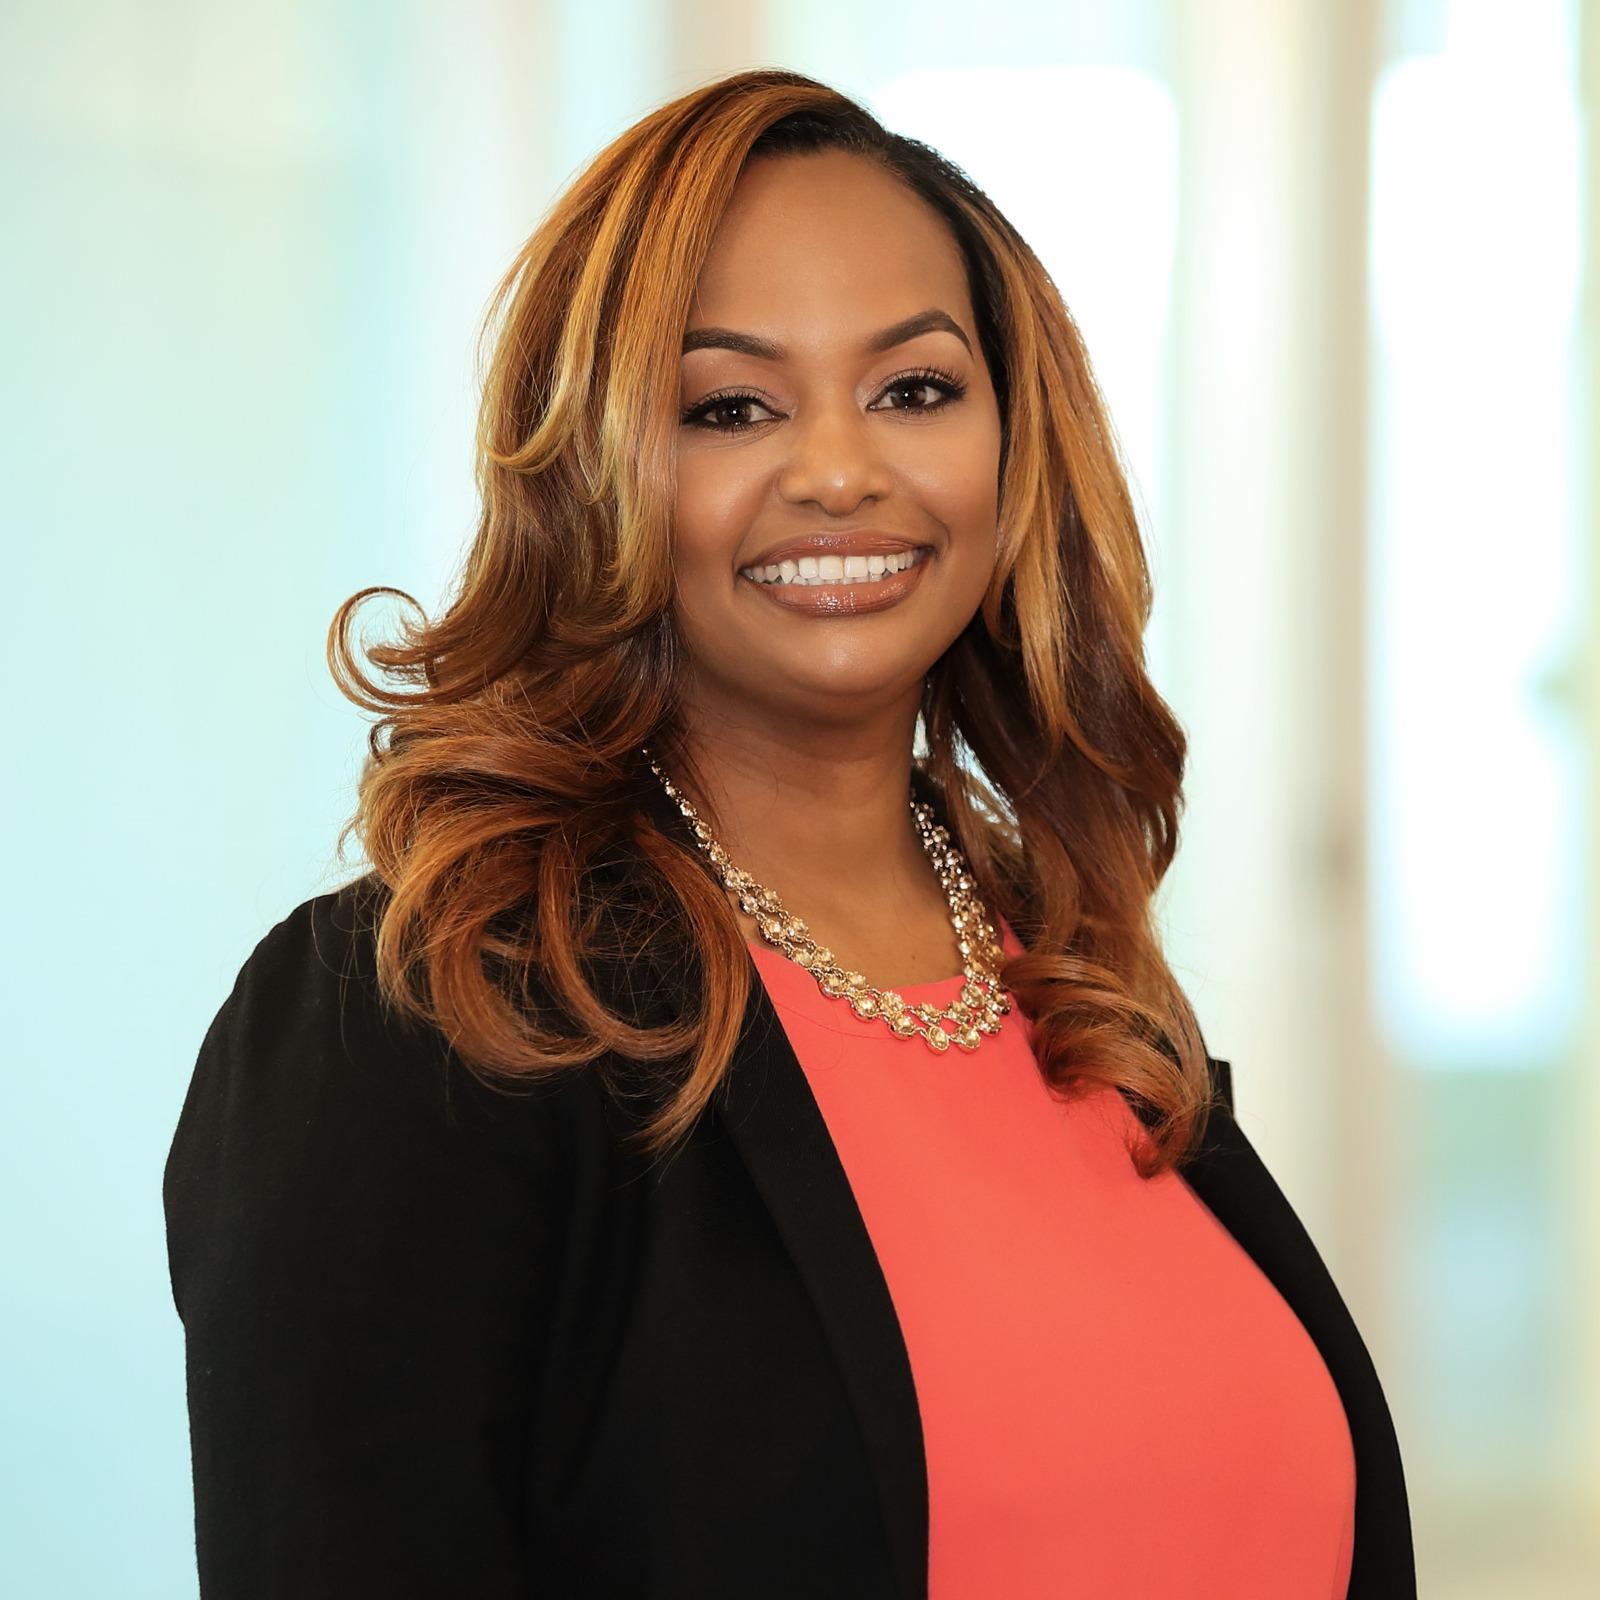 Sharawn Connors, a Black woman with medium auburn hair, orange blouse, and black jacket